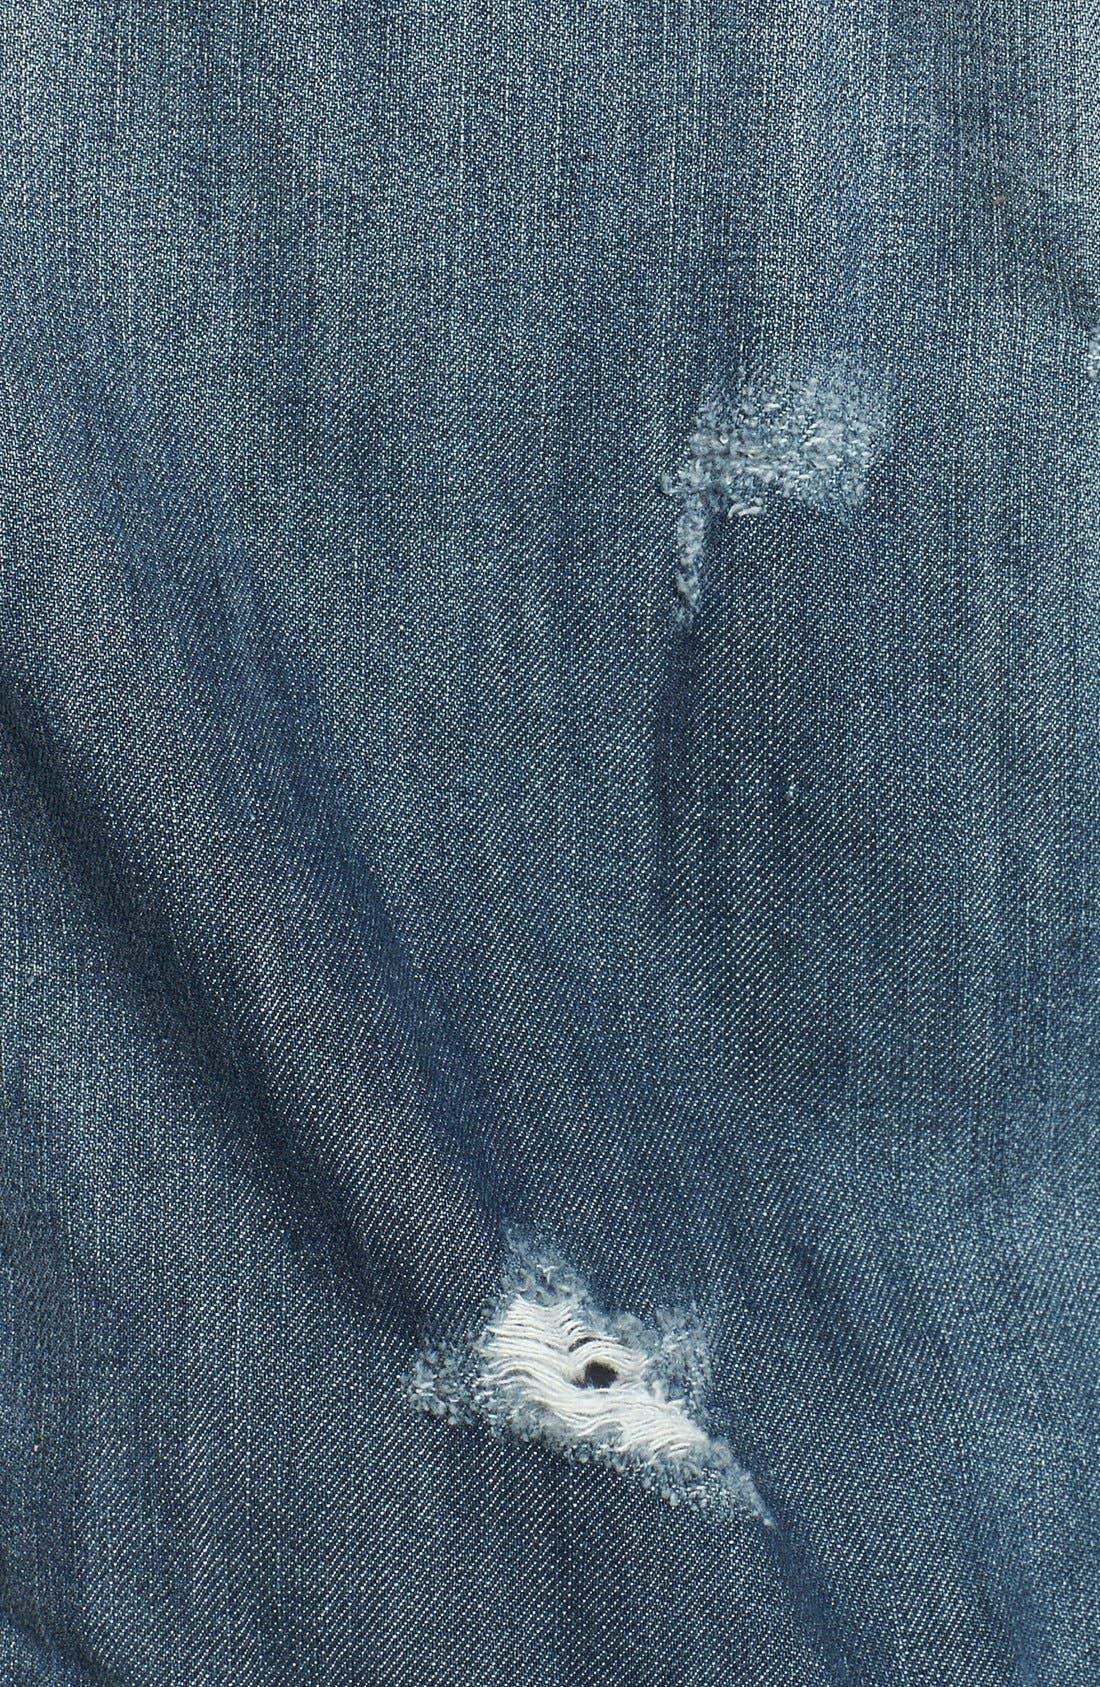 Alternate Image 3  - BCBGMAXAZRIA 'Nikki' Faux Leather Sleeve Denim Jacket